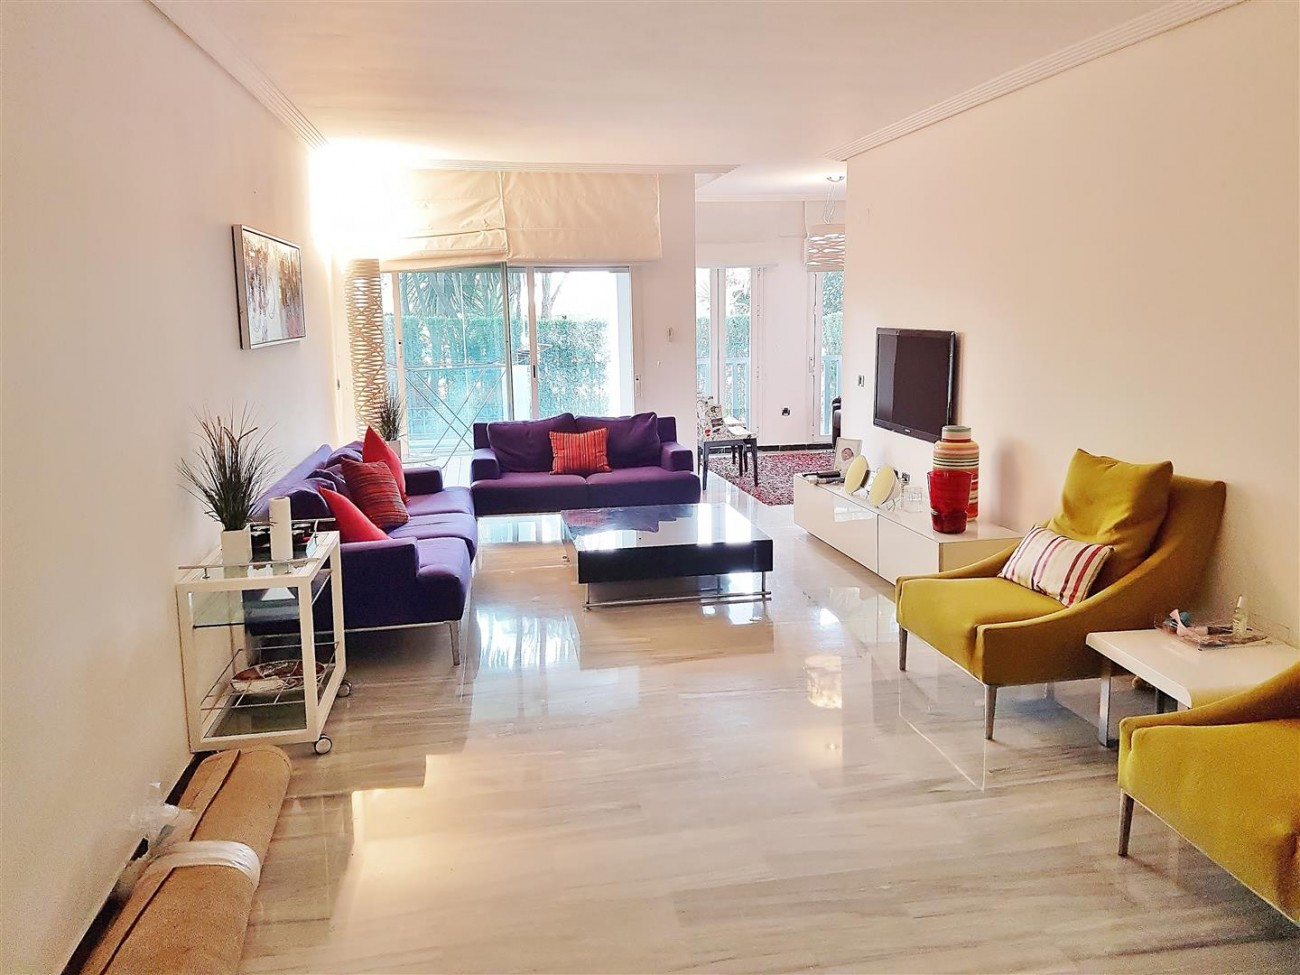 Beachside Apartment for sale Puerto Banus Marbella (15) (Large)